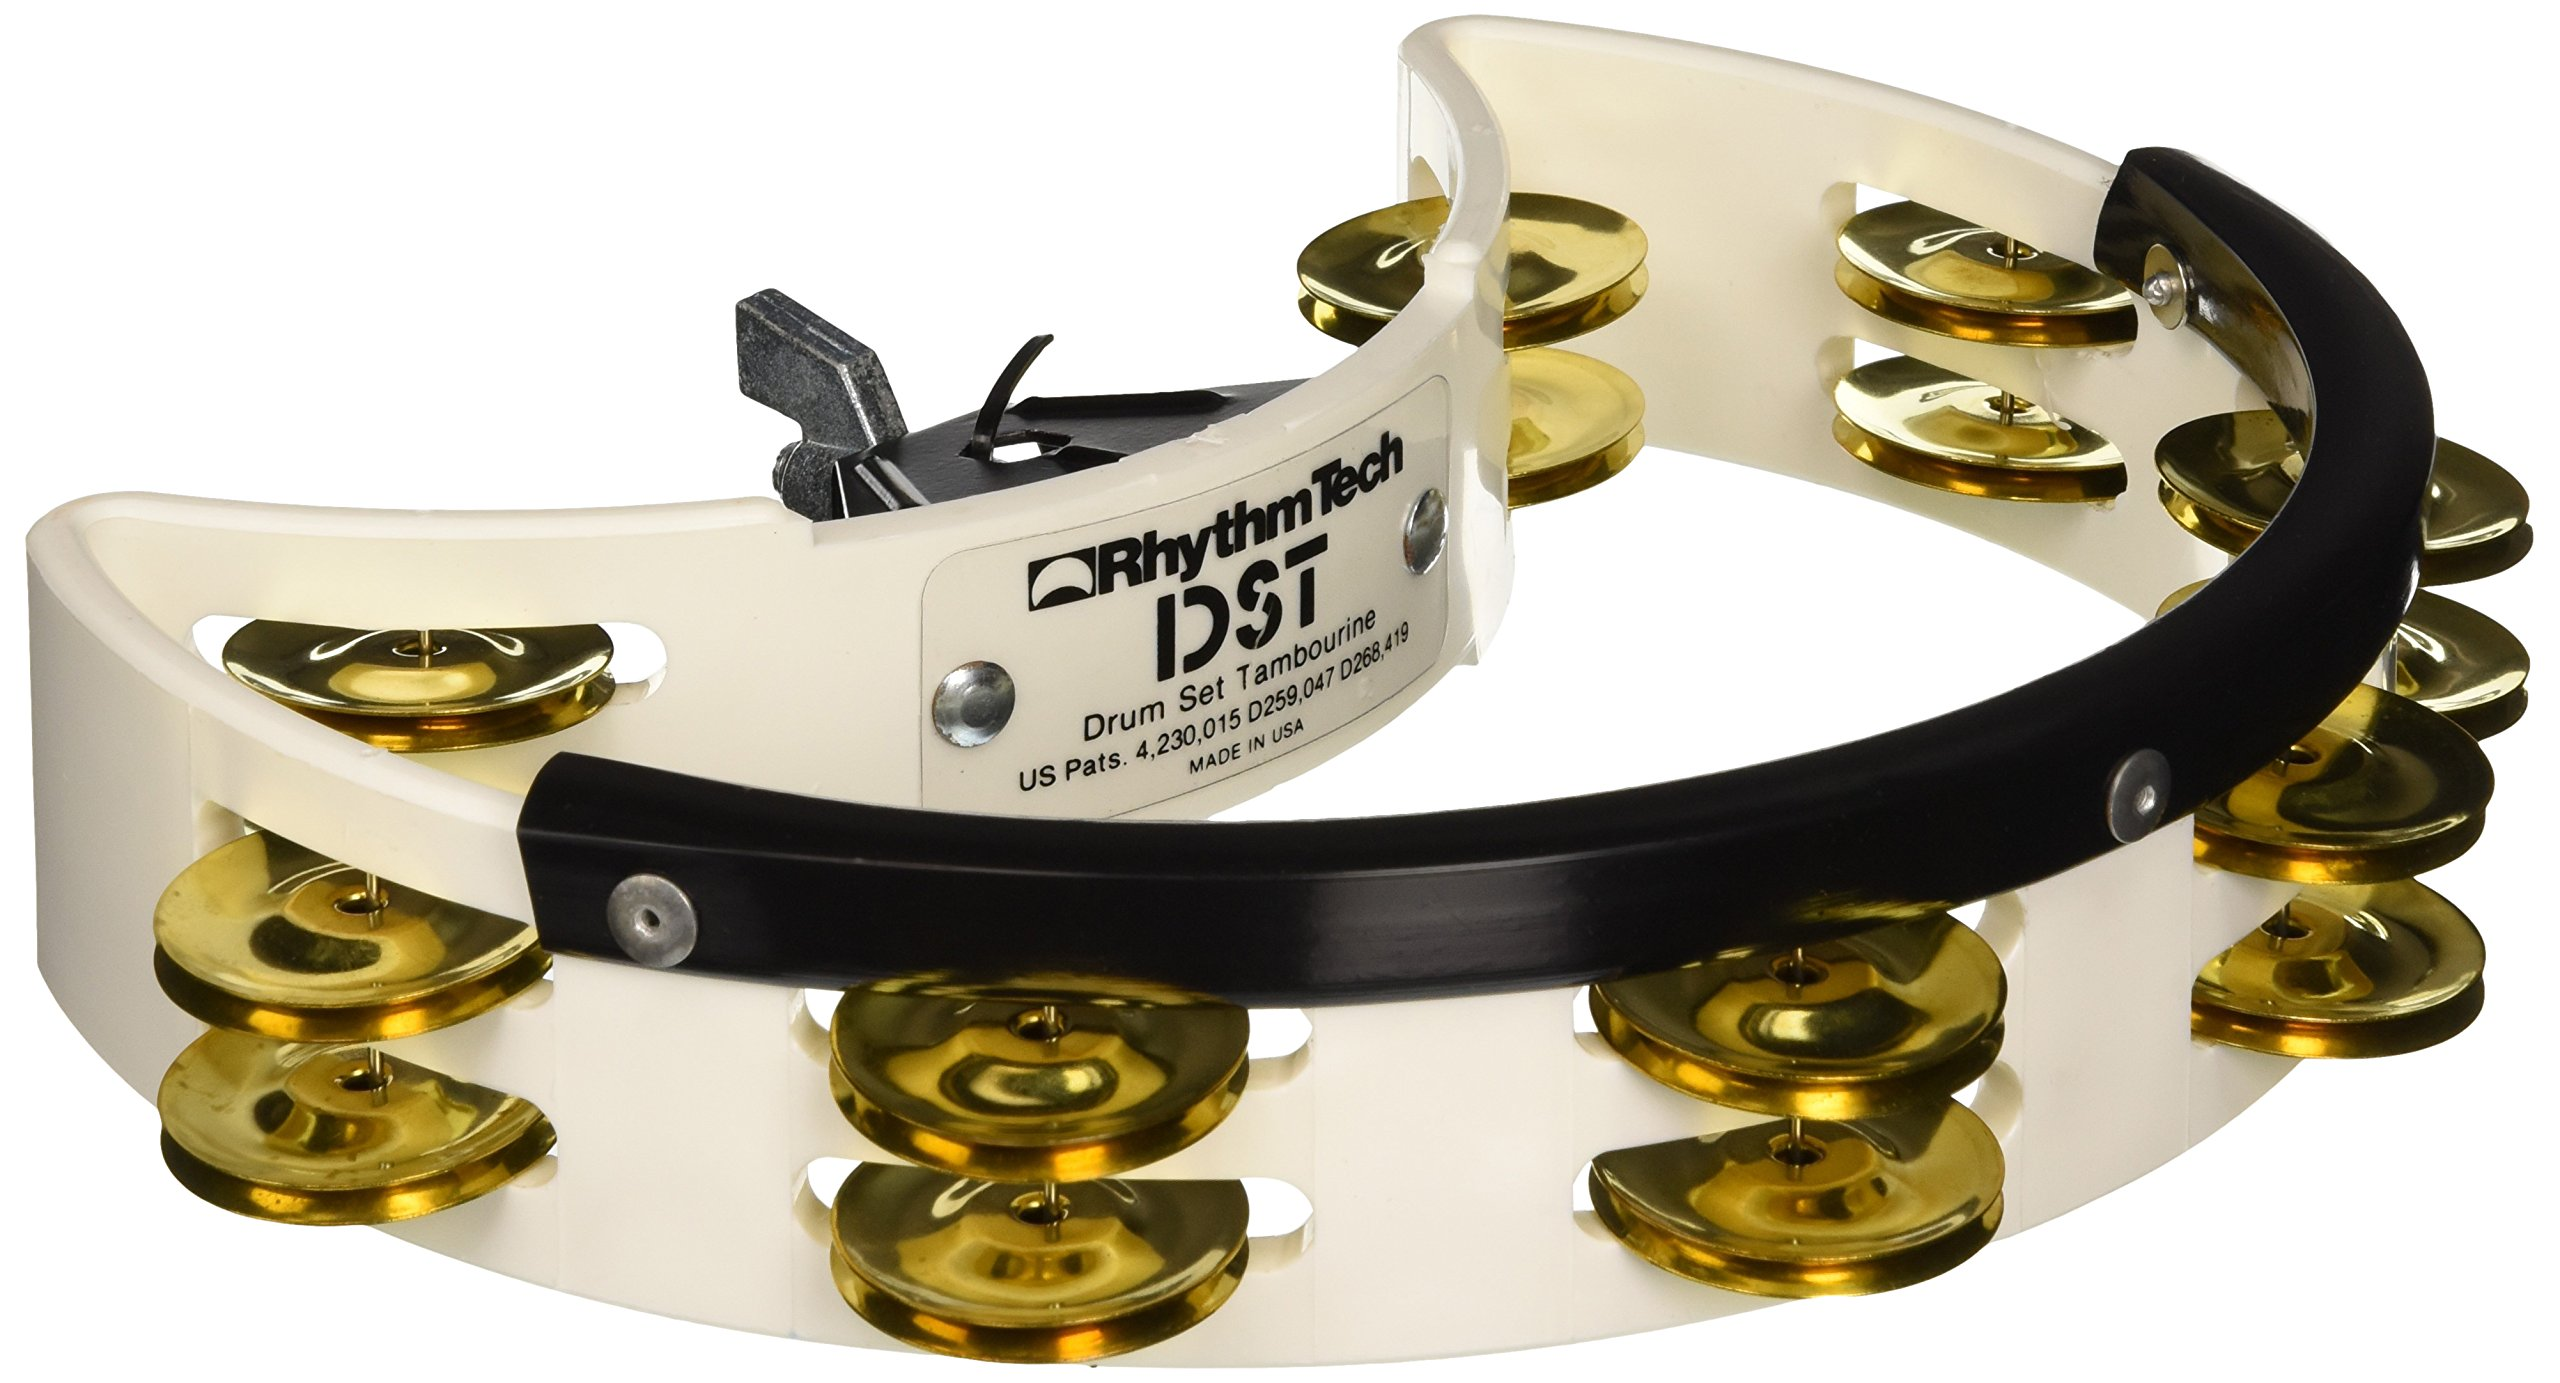 Rhythm Tech DST 21 Drum Set Tambourine-White-Brass Jingles